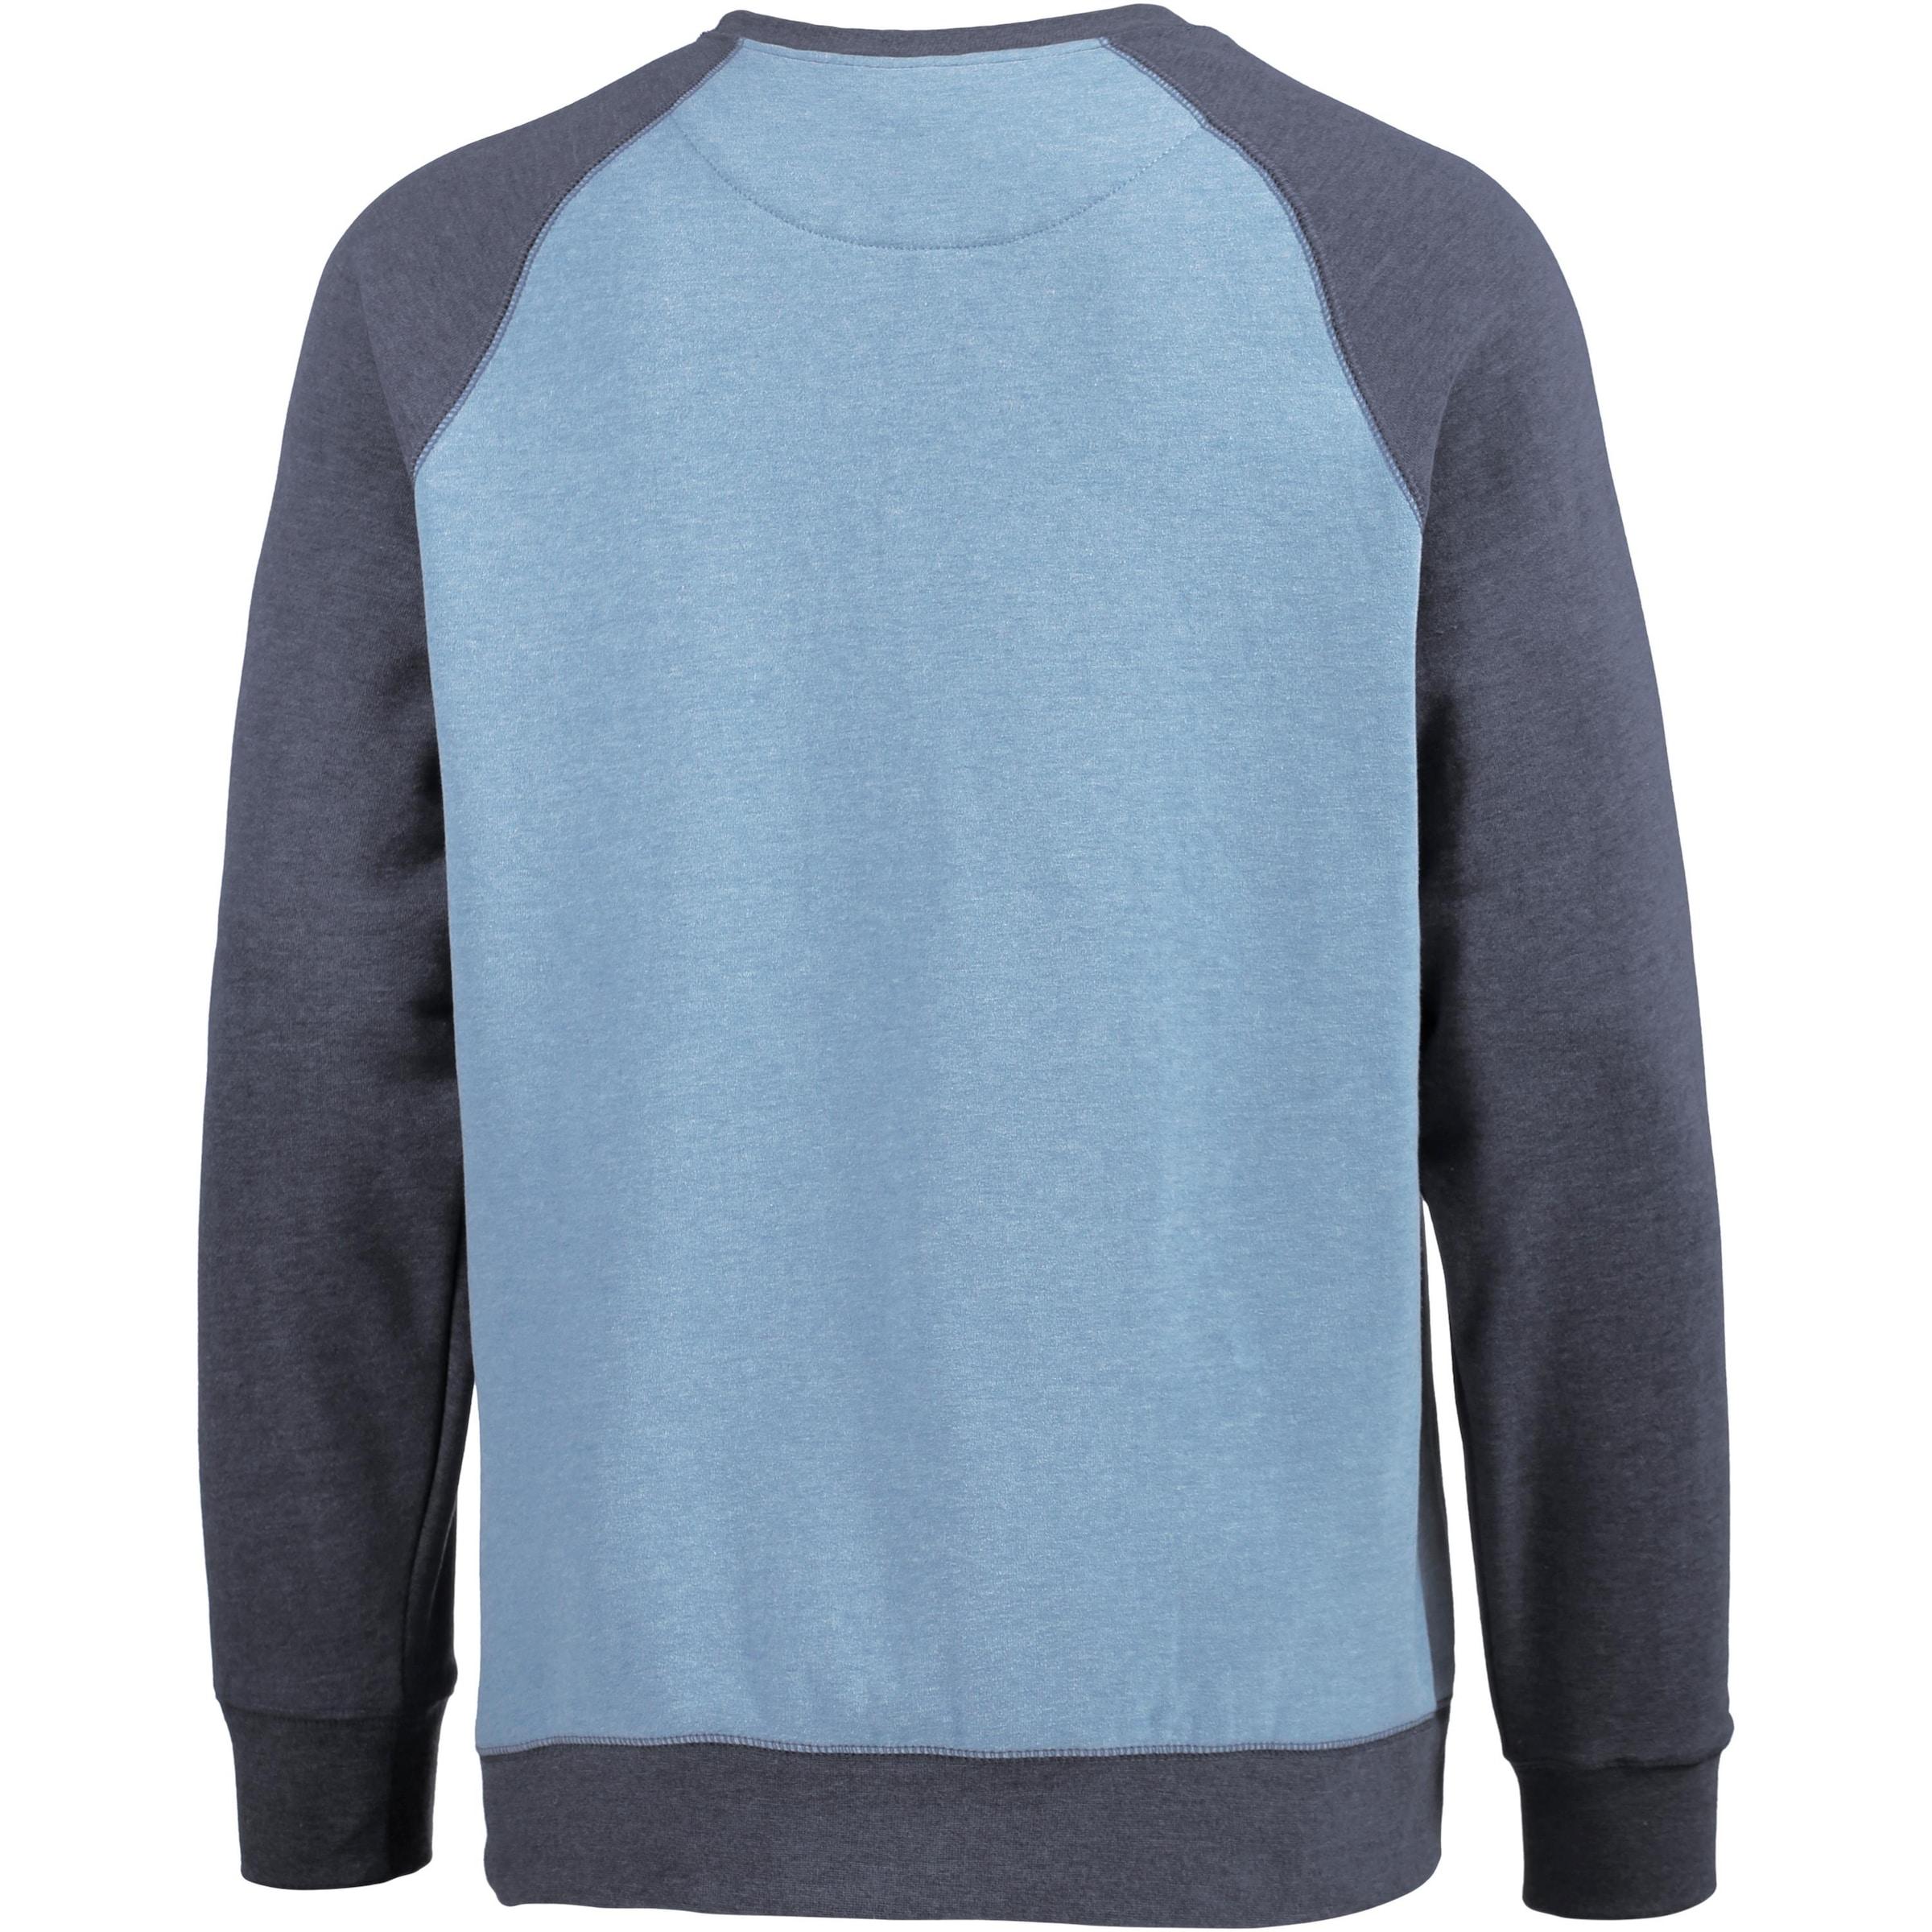 Verkauf Geniue Händler Günstig Kaufen Perfekt BURTON 'VAULT' Sweatshirt Auslass 100% Garantiert rXgvHj